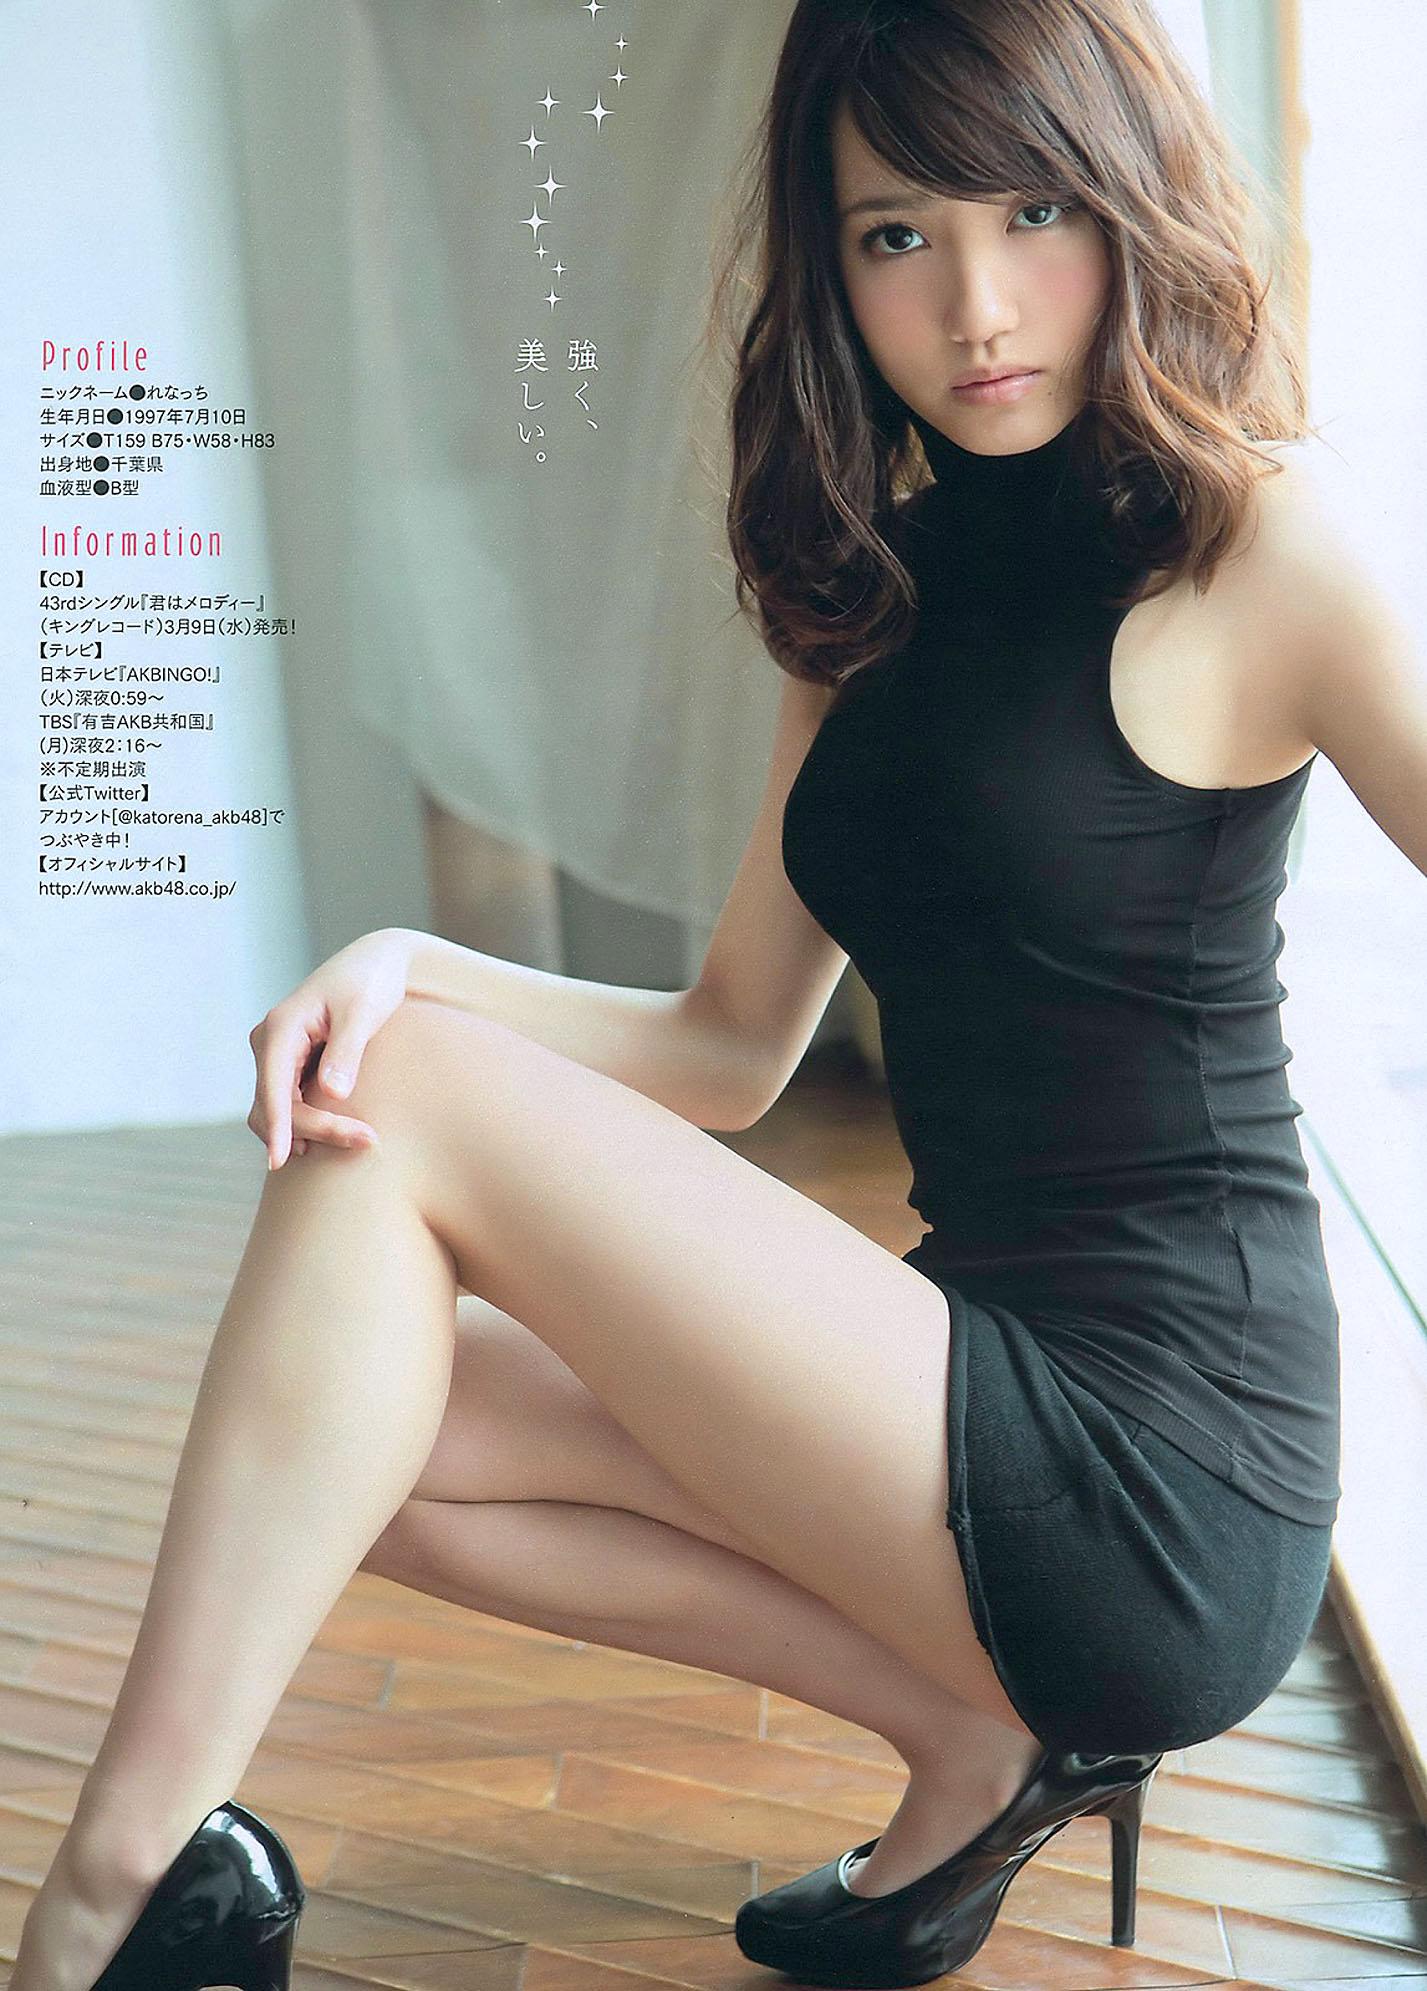 KRena Young Magazine 160314 04.jpg